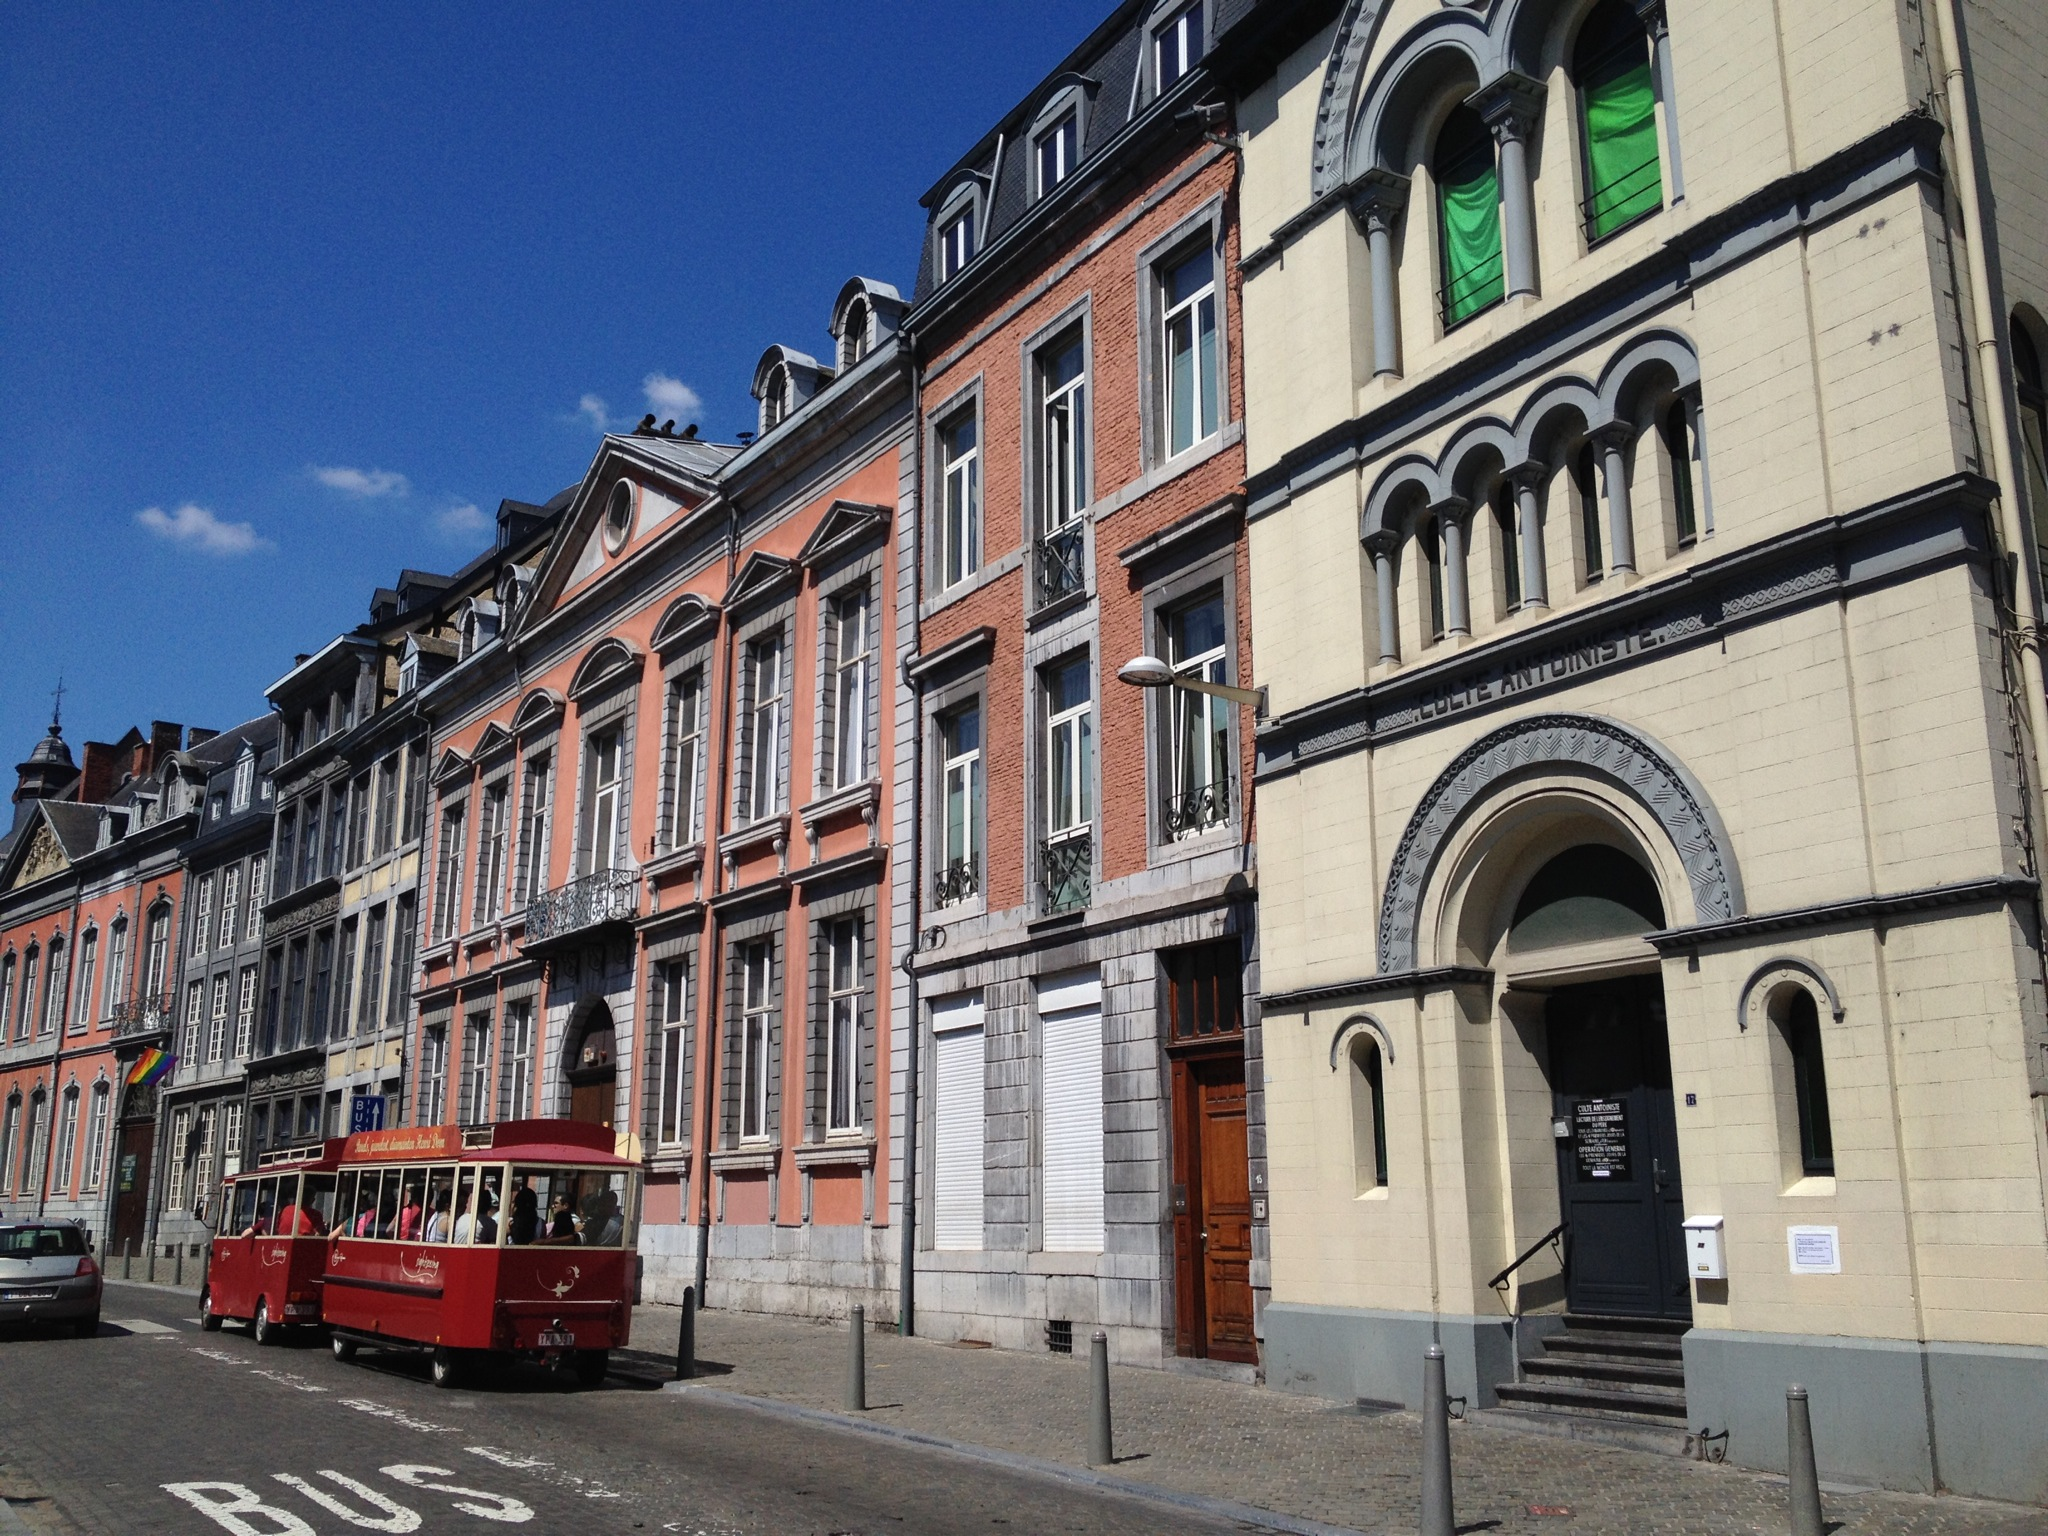 Luik, Belgium